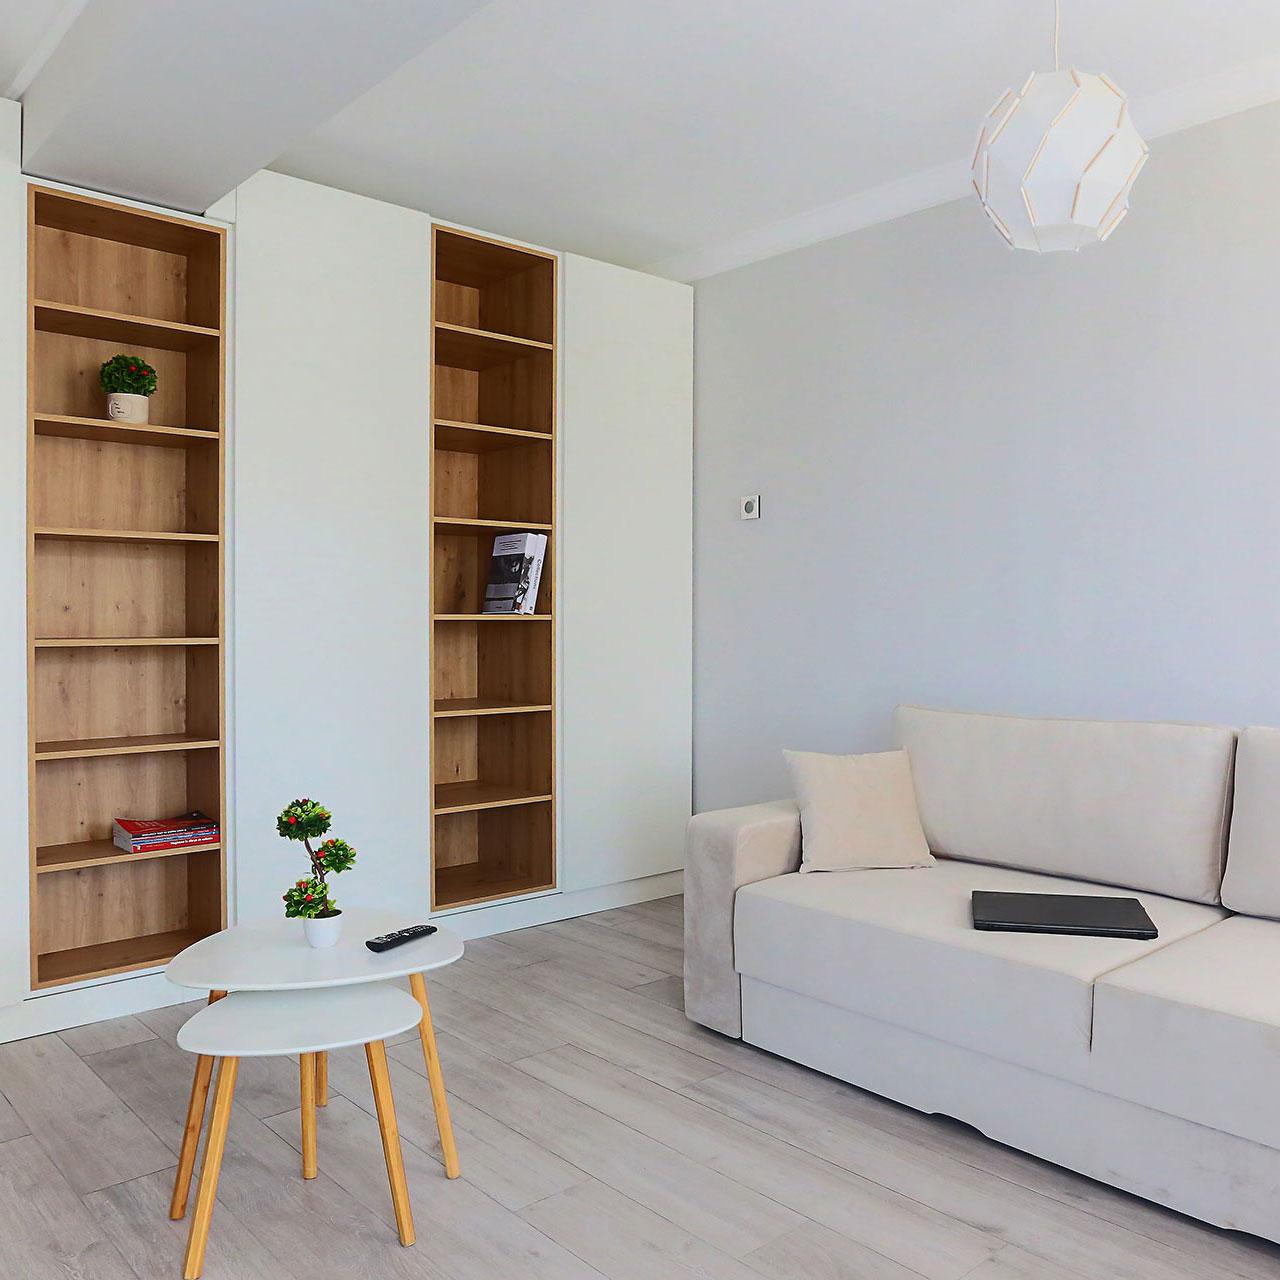 Apartamente cu 2 camere de vanzare Bucuresti - Catedral Residence - Marriott, Piata Unirii, 13 Septembrie, Izvor - G0 - 2